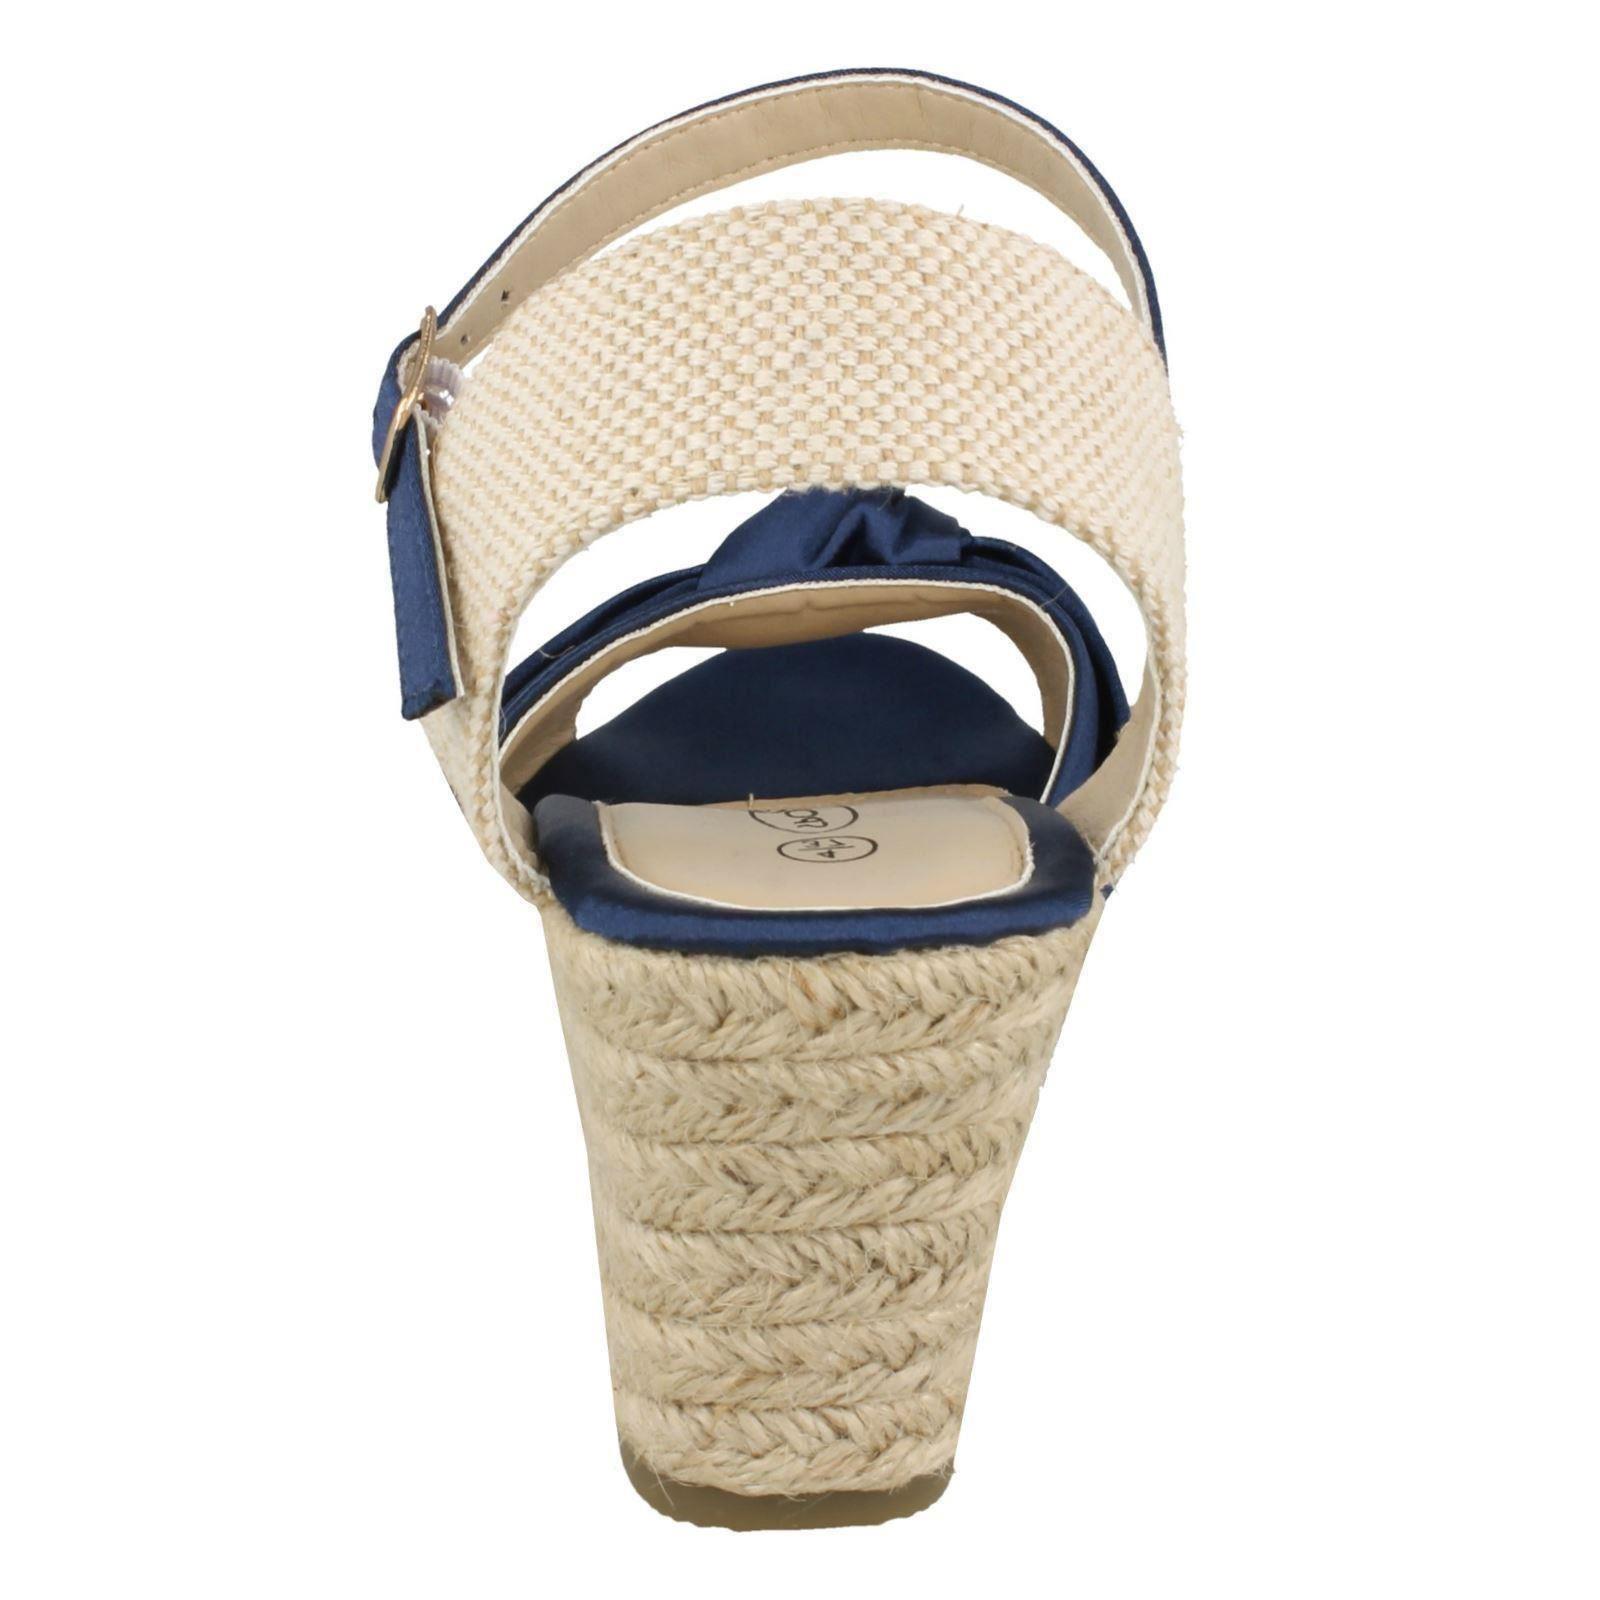 Ladies Spot On Twist Satin Textile Bow Espidrille Med Wedge Heel Sandals F2R269